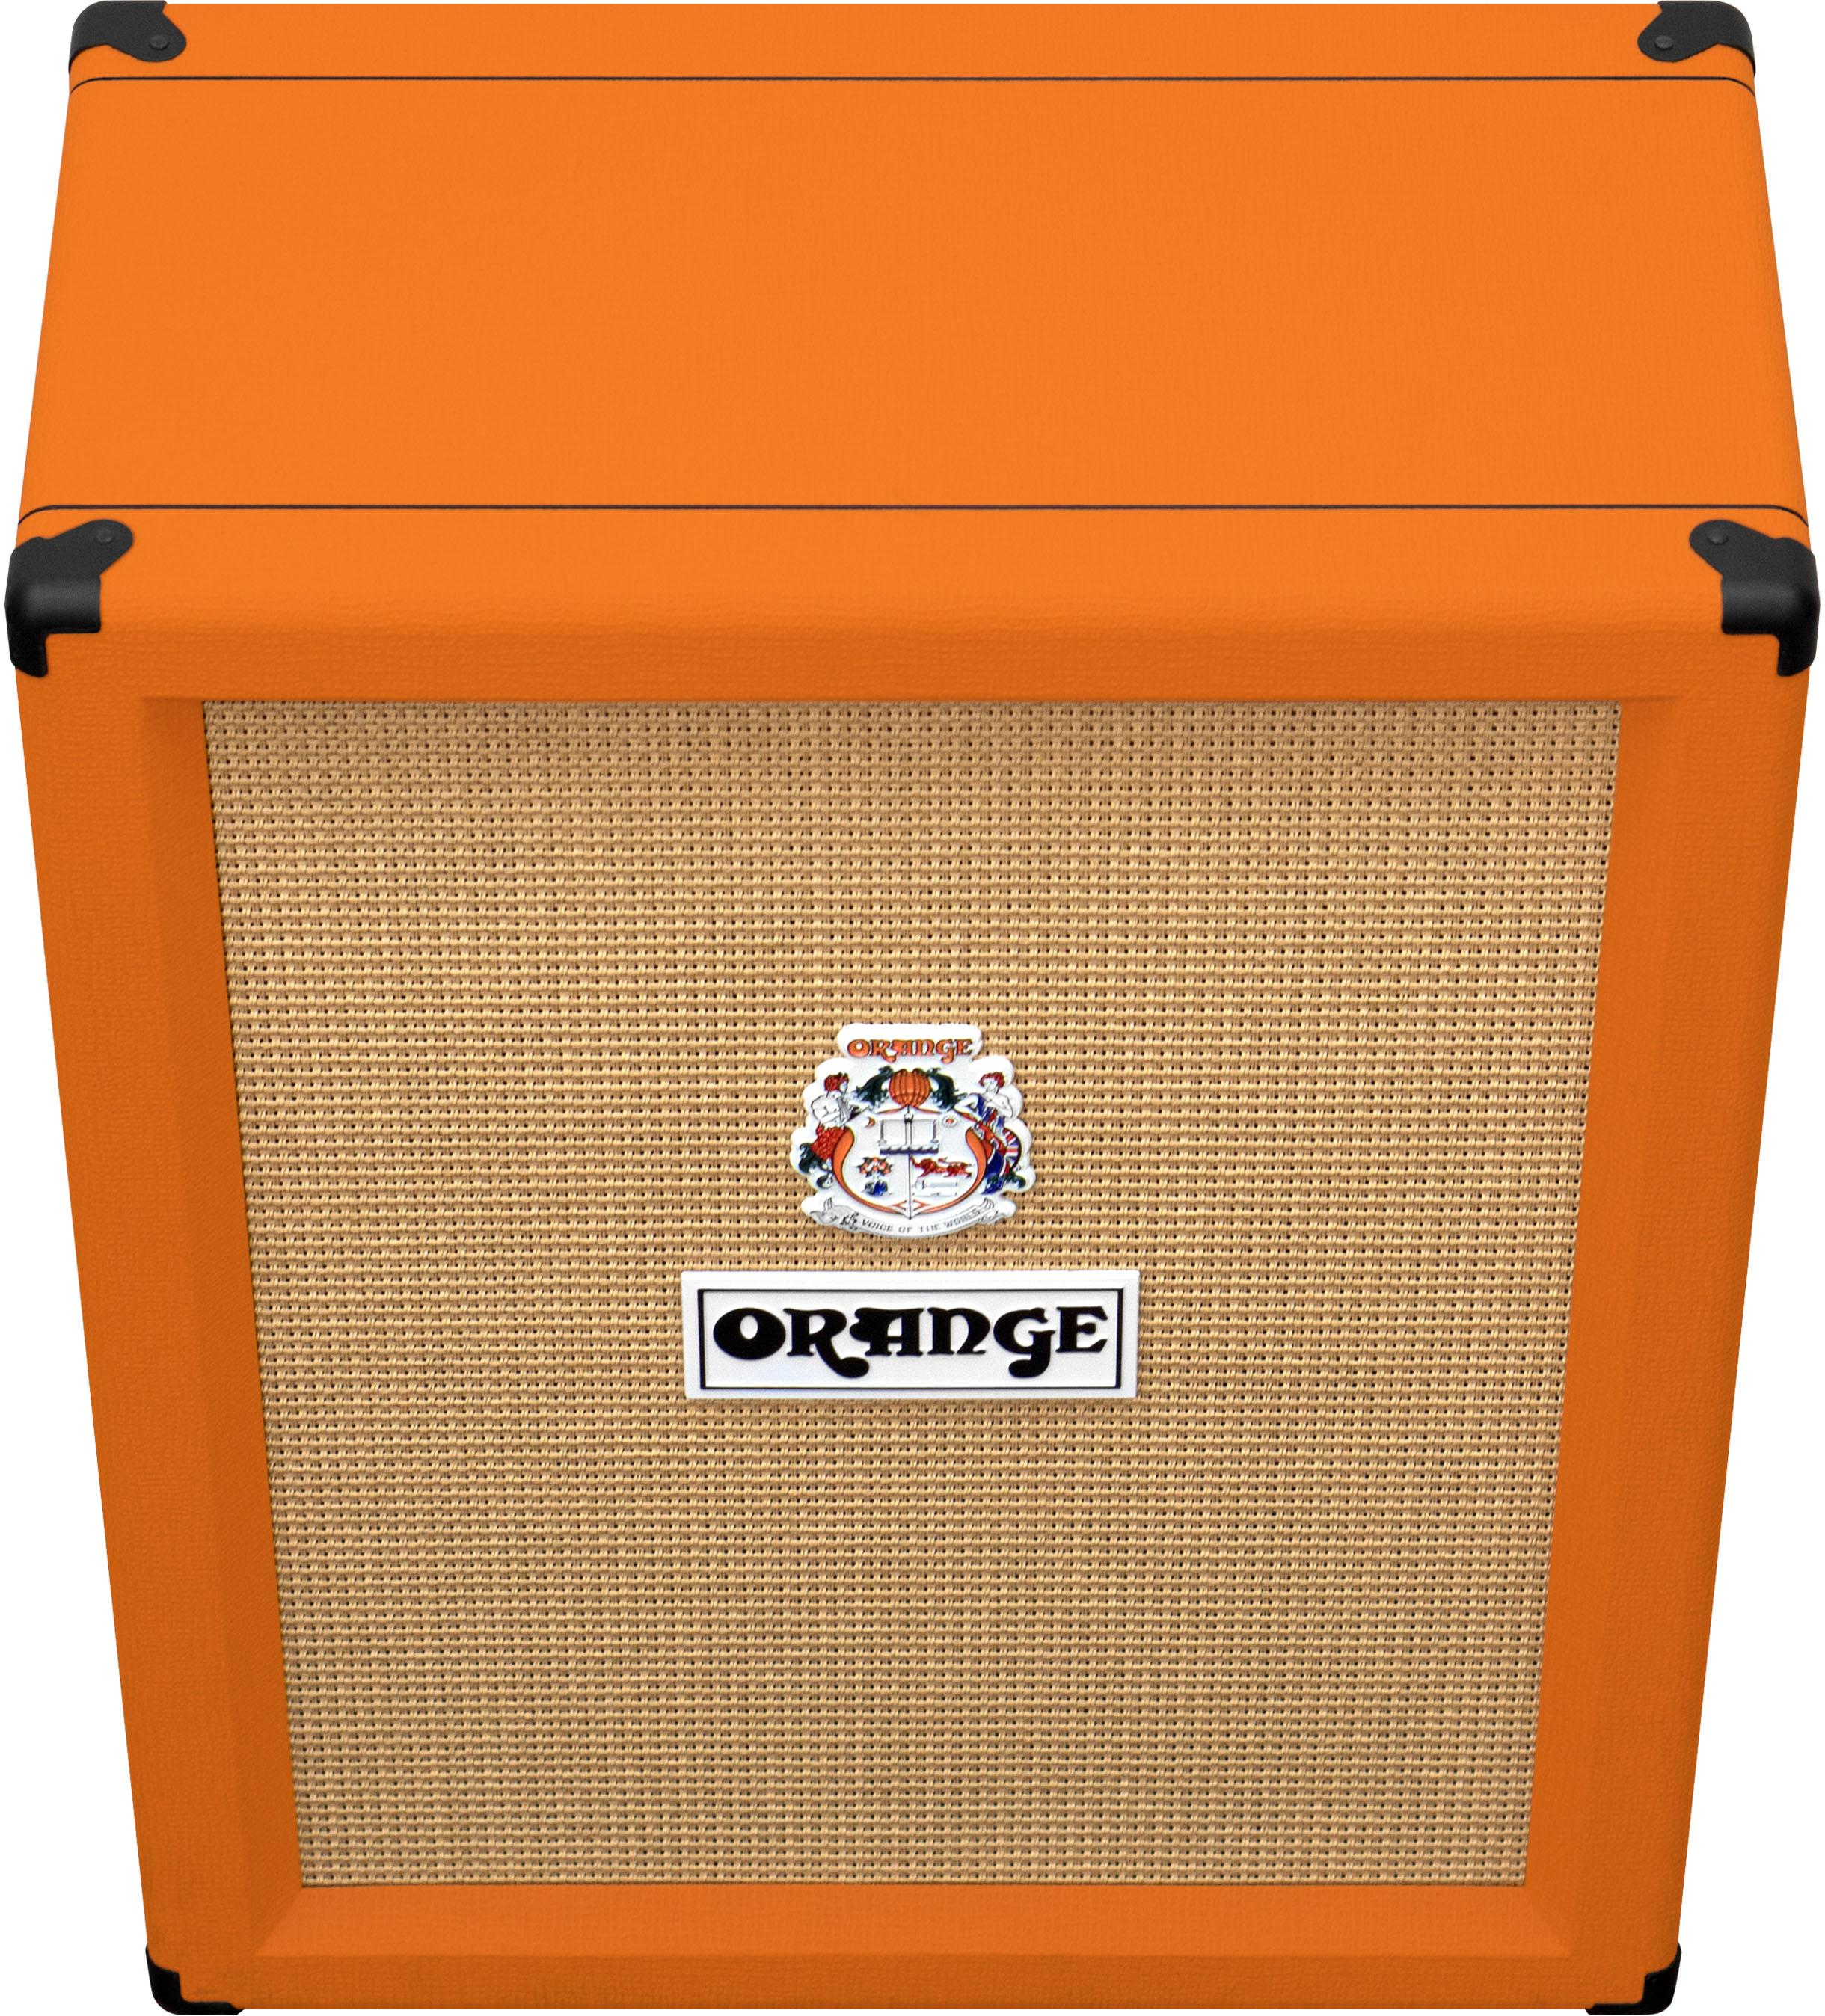 Orange-PPC212V-2x12-Inch-Vertical-Guitar-Amplifier-Cabinet thumbnail 6